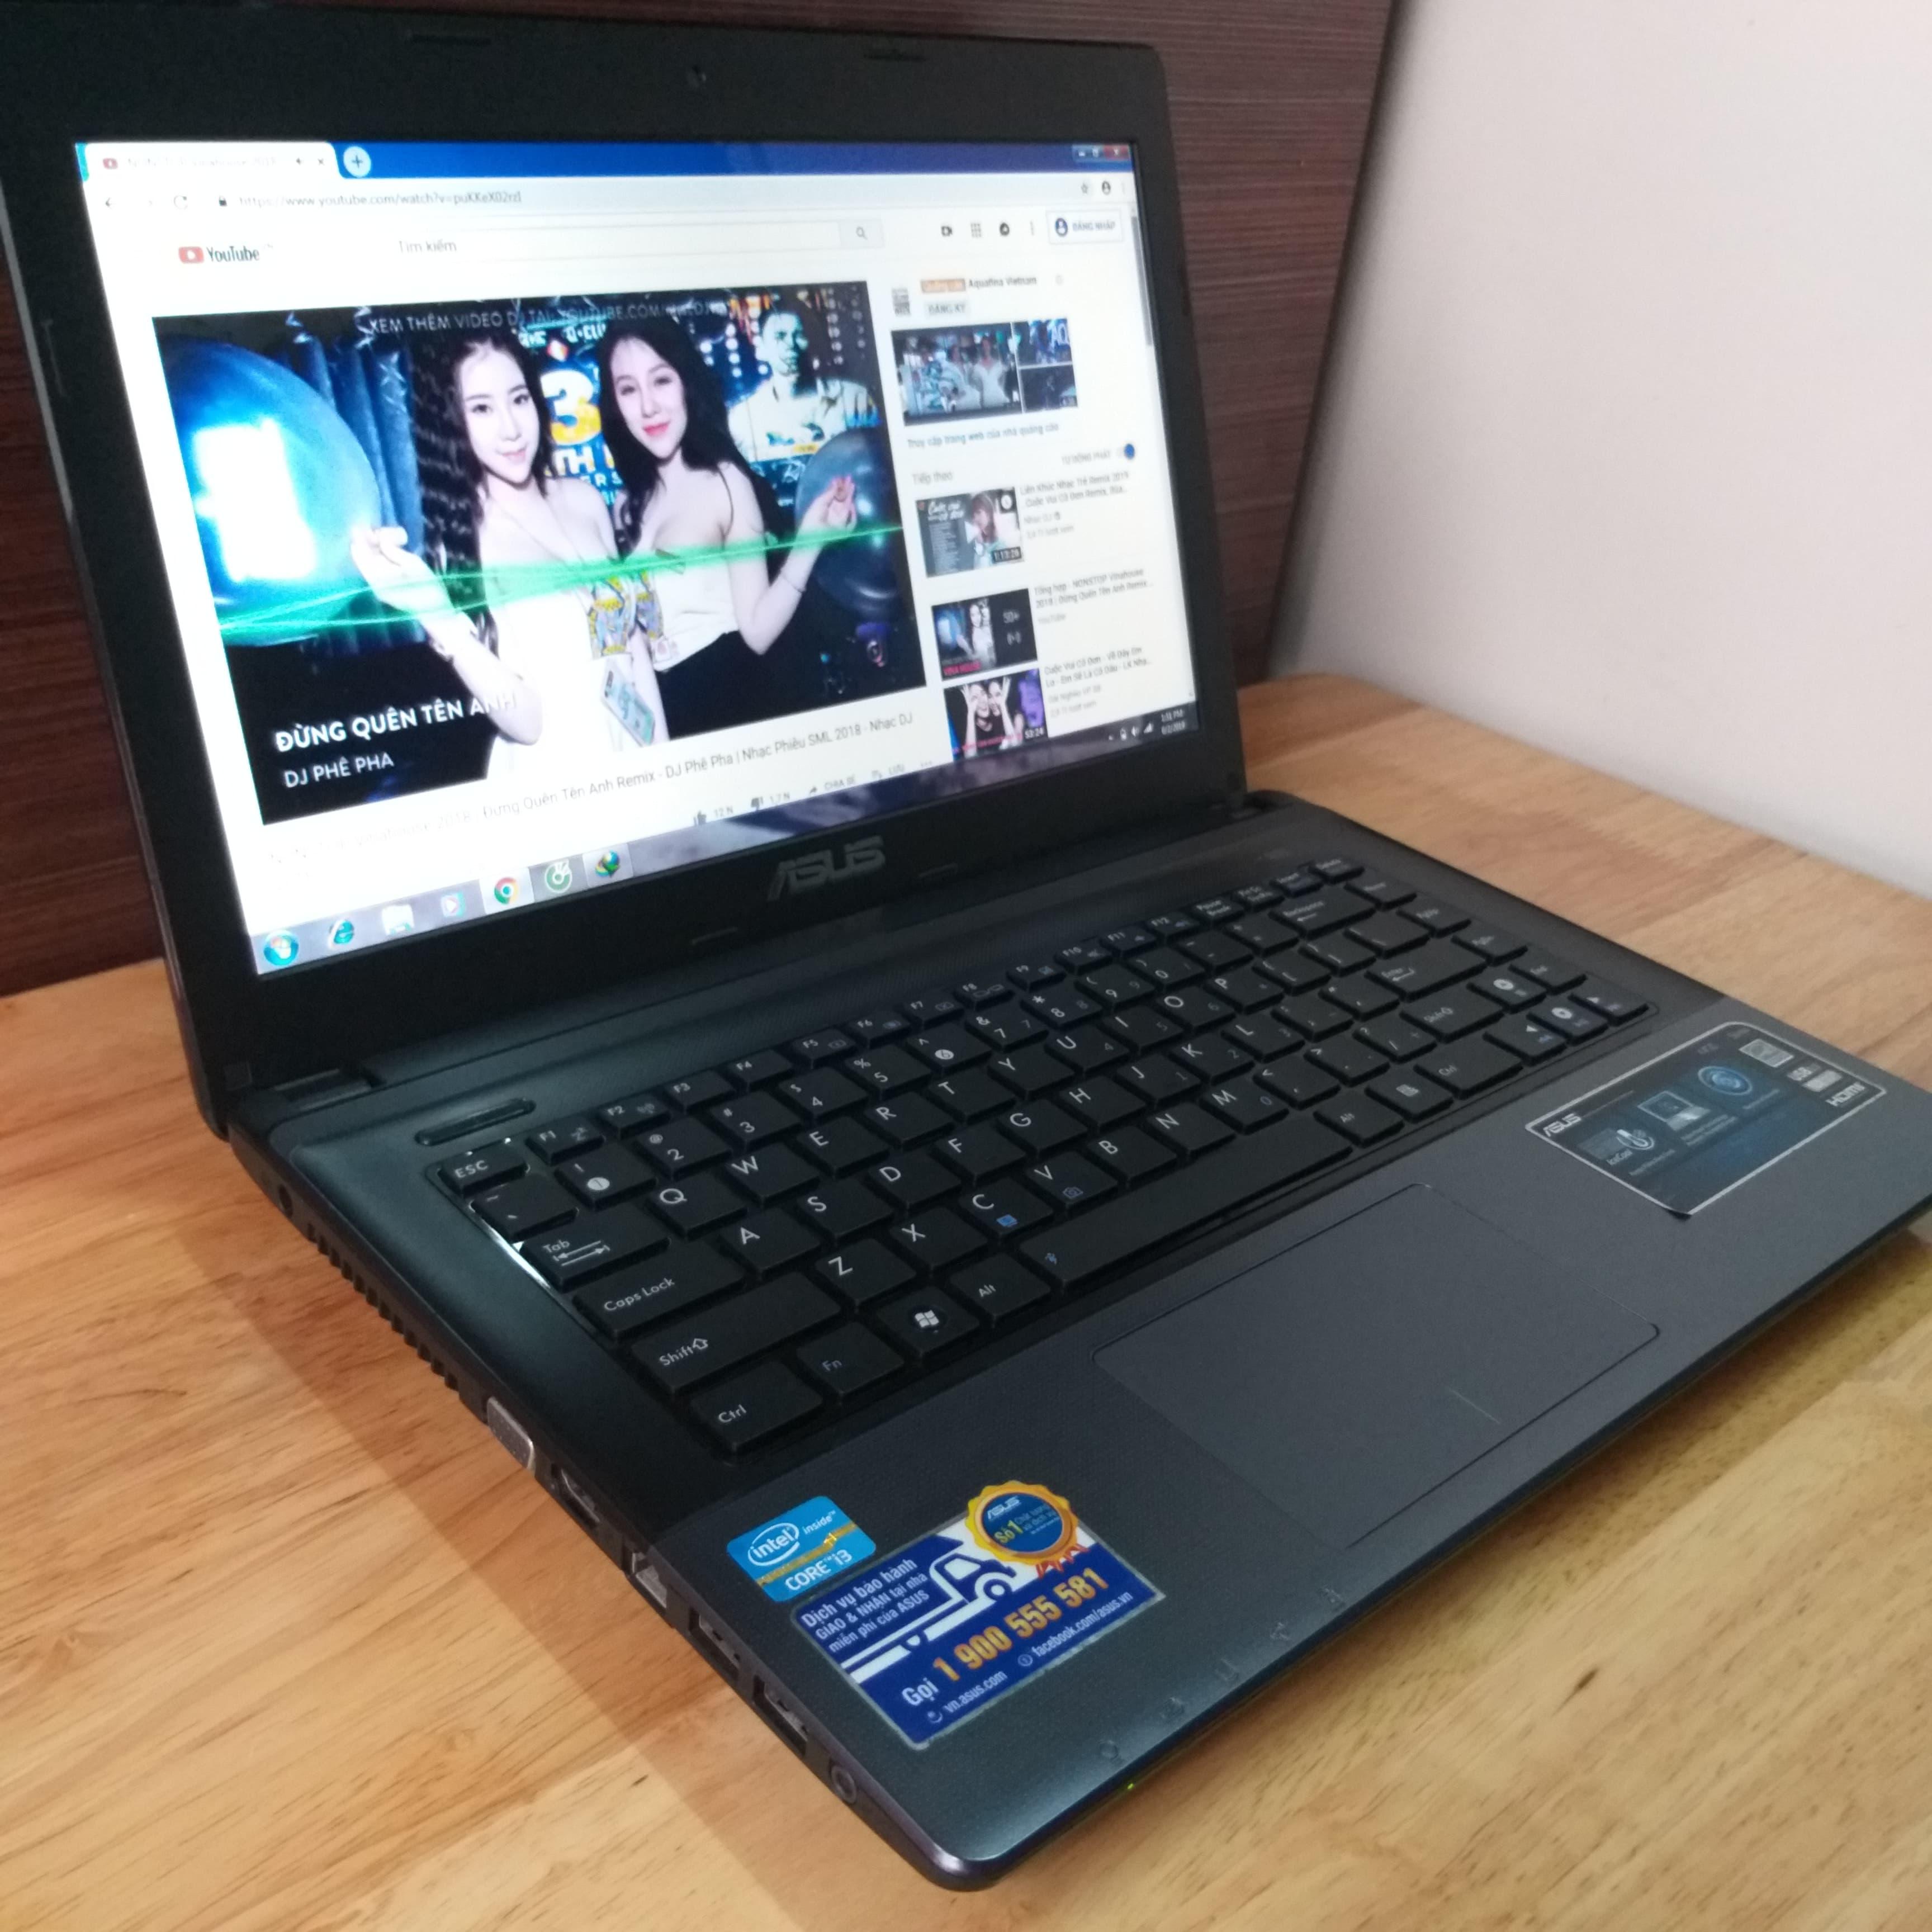 Laptop Asus X45C, I3 2370M RAM 4GB HDD 500GB